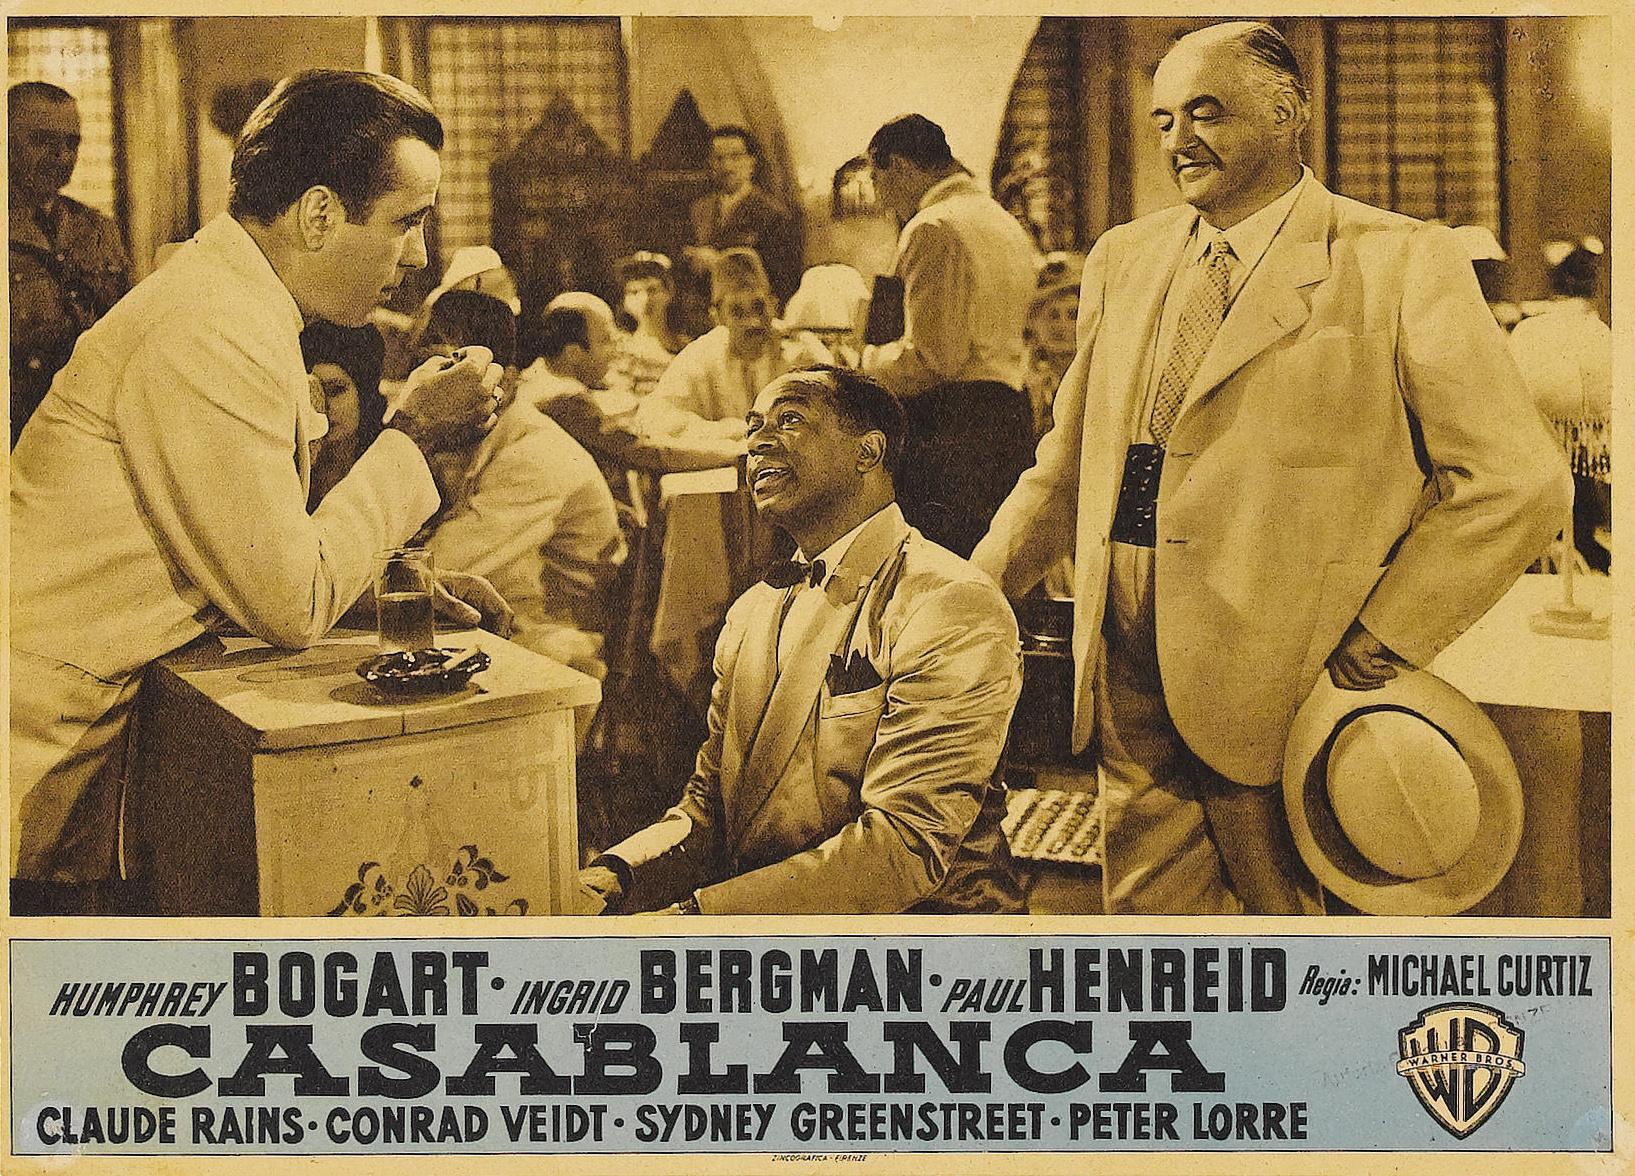 Humphrey Bogart, Sydney Greenstreet, and Dooley Wilson in Casablanca (1942)